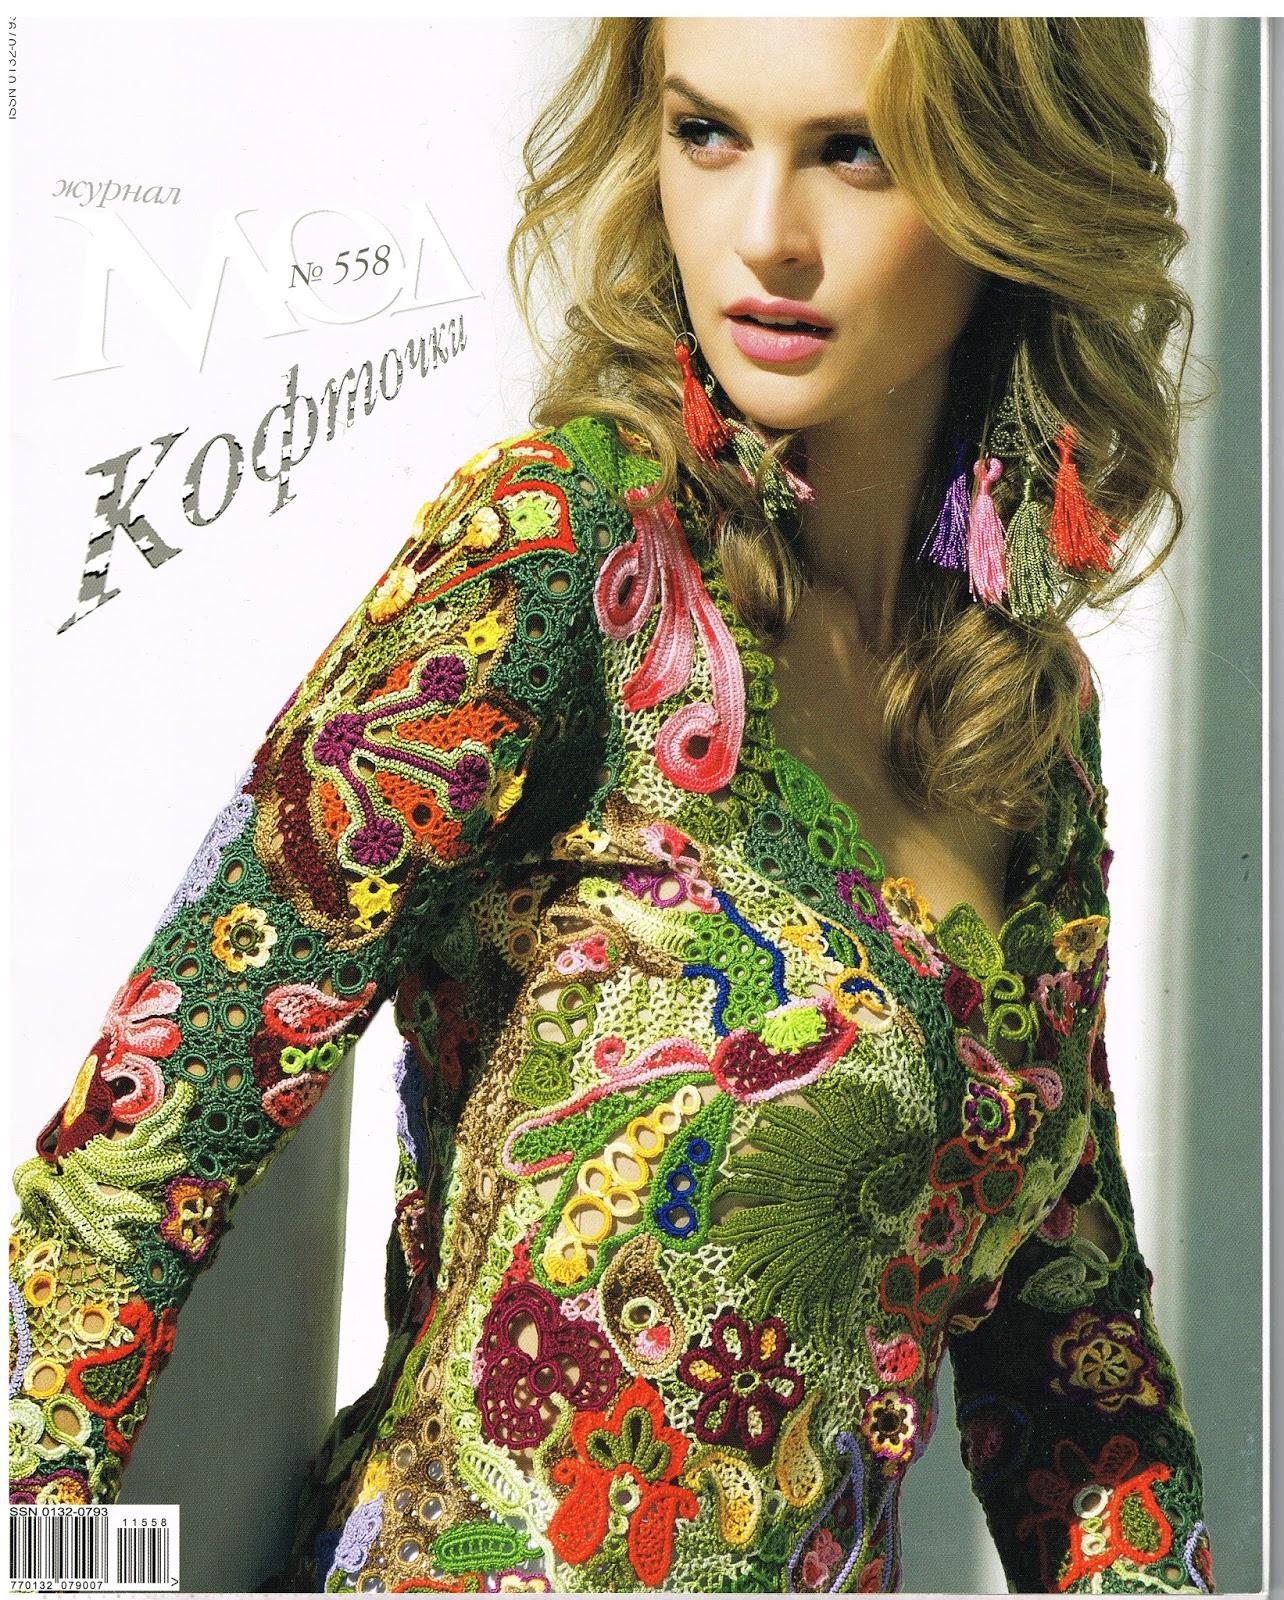 Yarn Scraps: Knitting in Russian